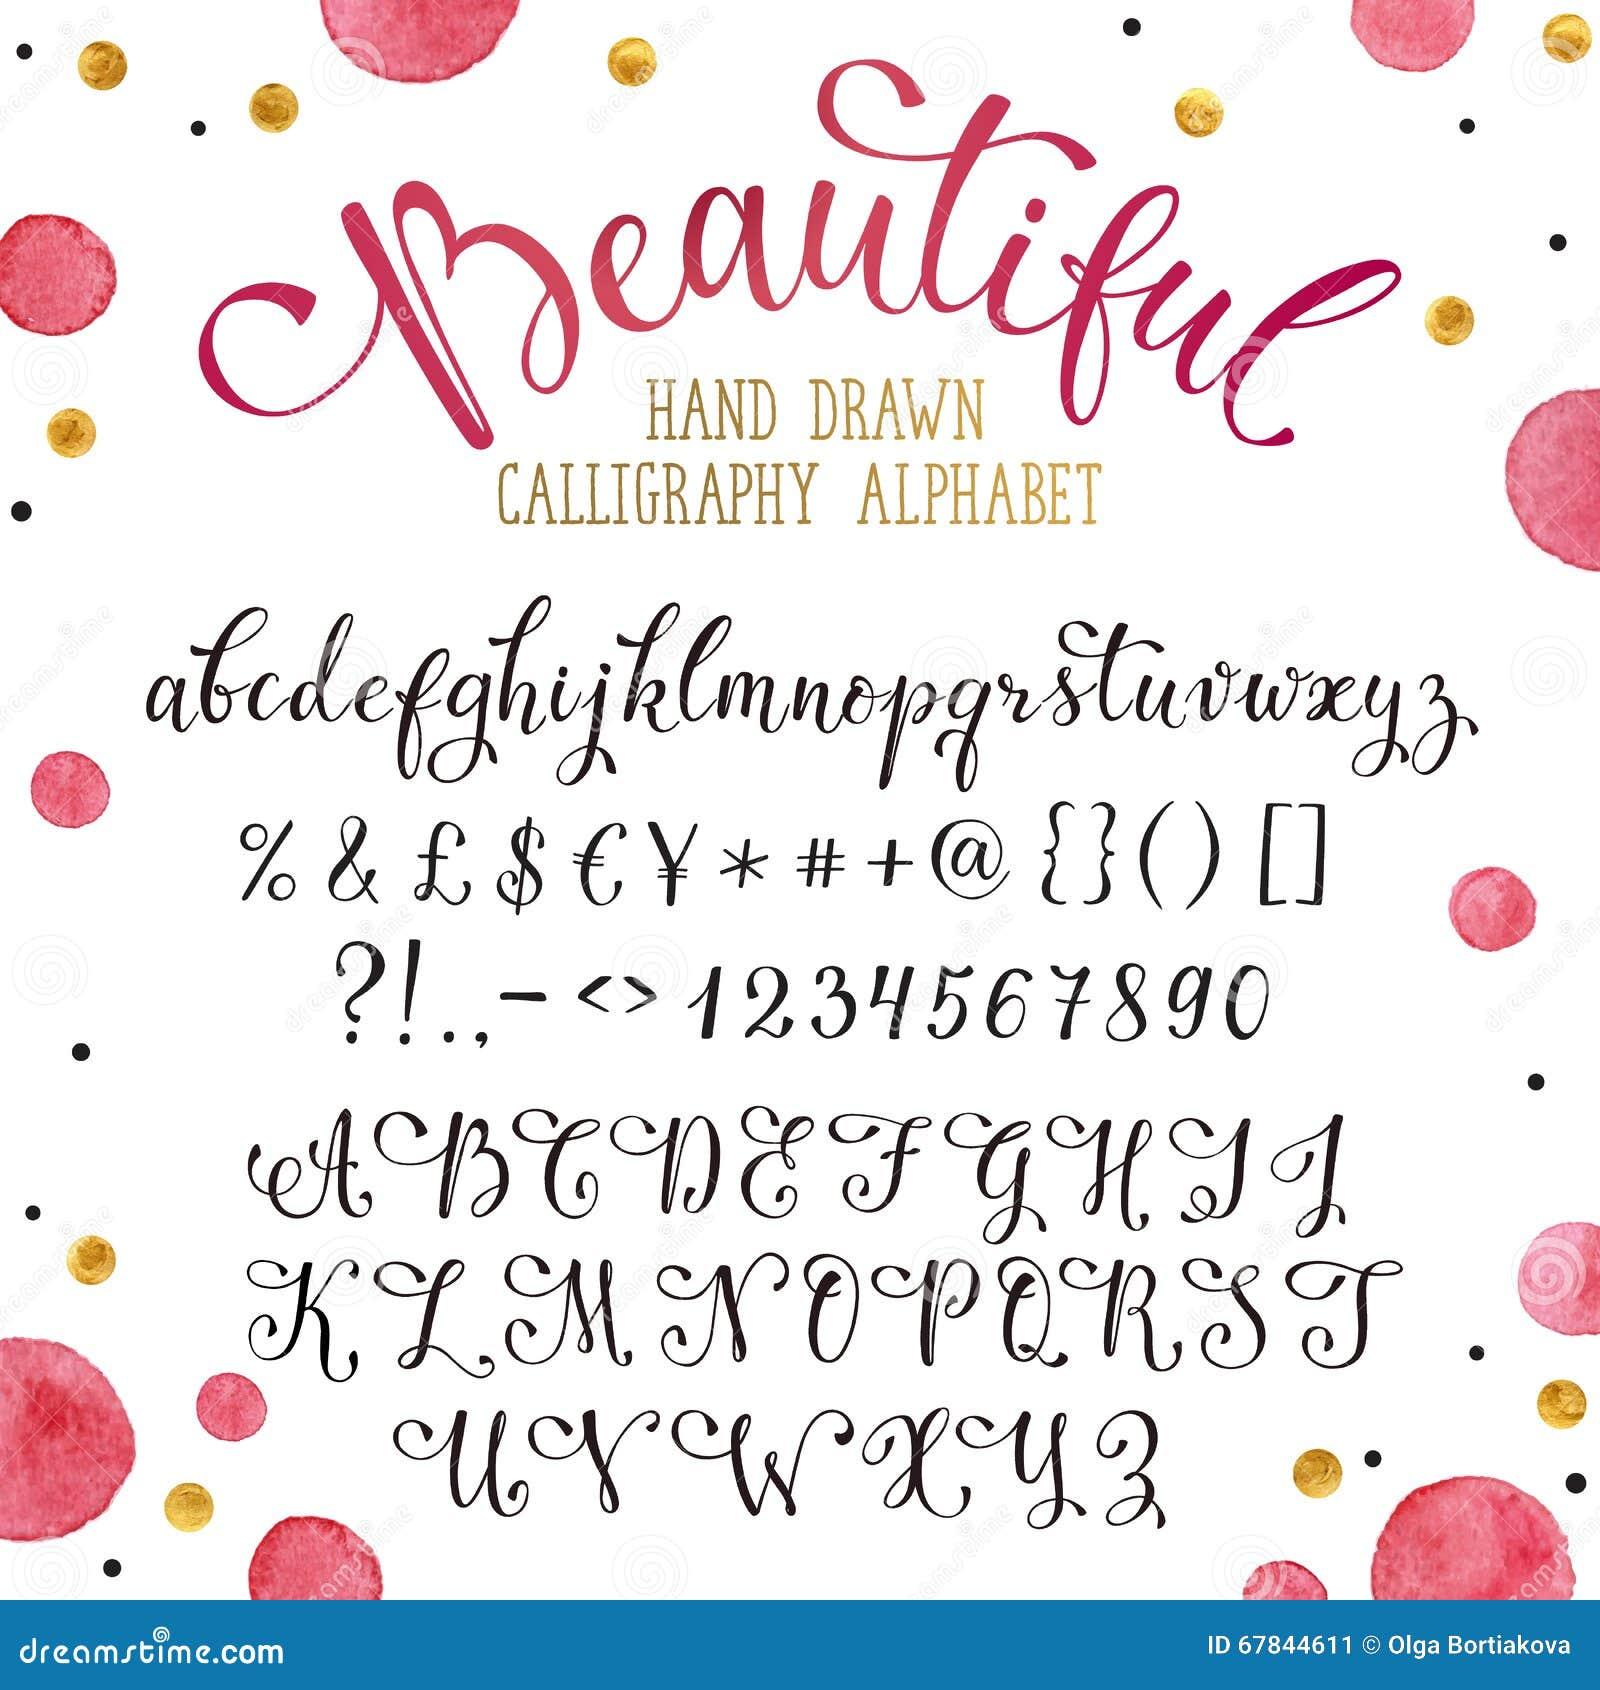 Hand drawn calligraphy font stock vector illustration